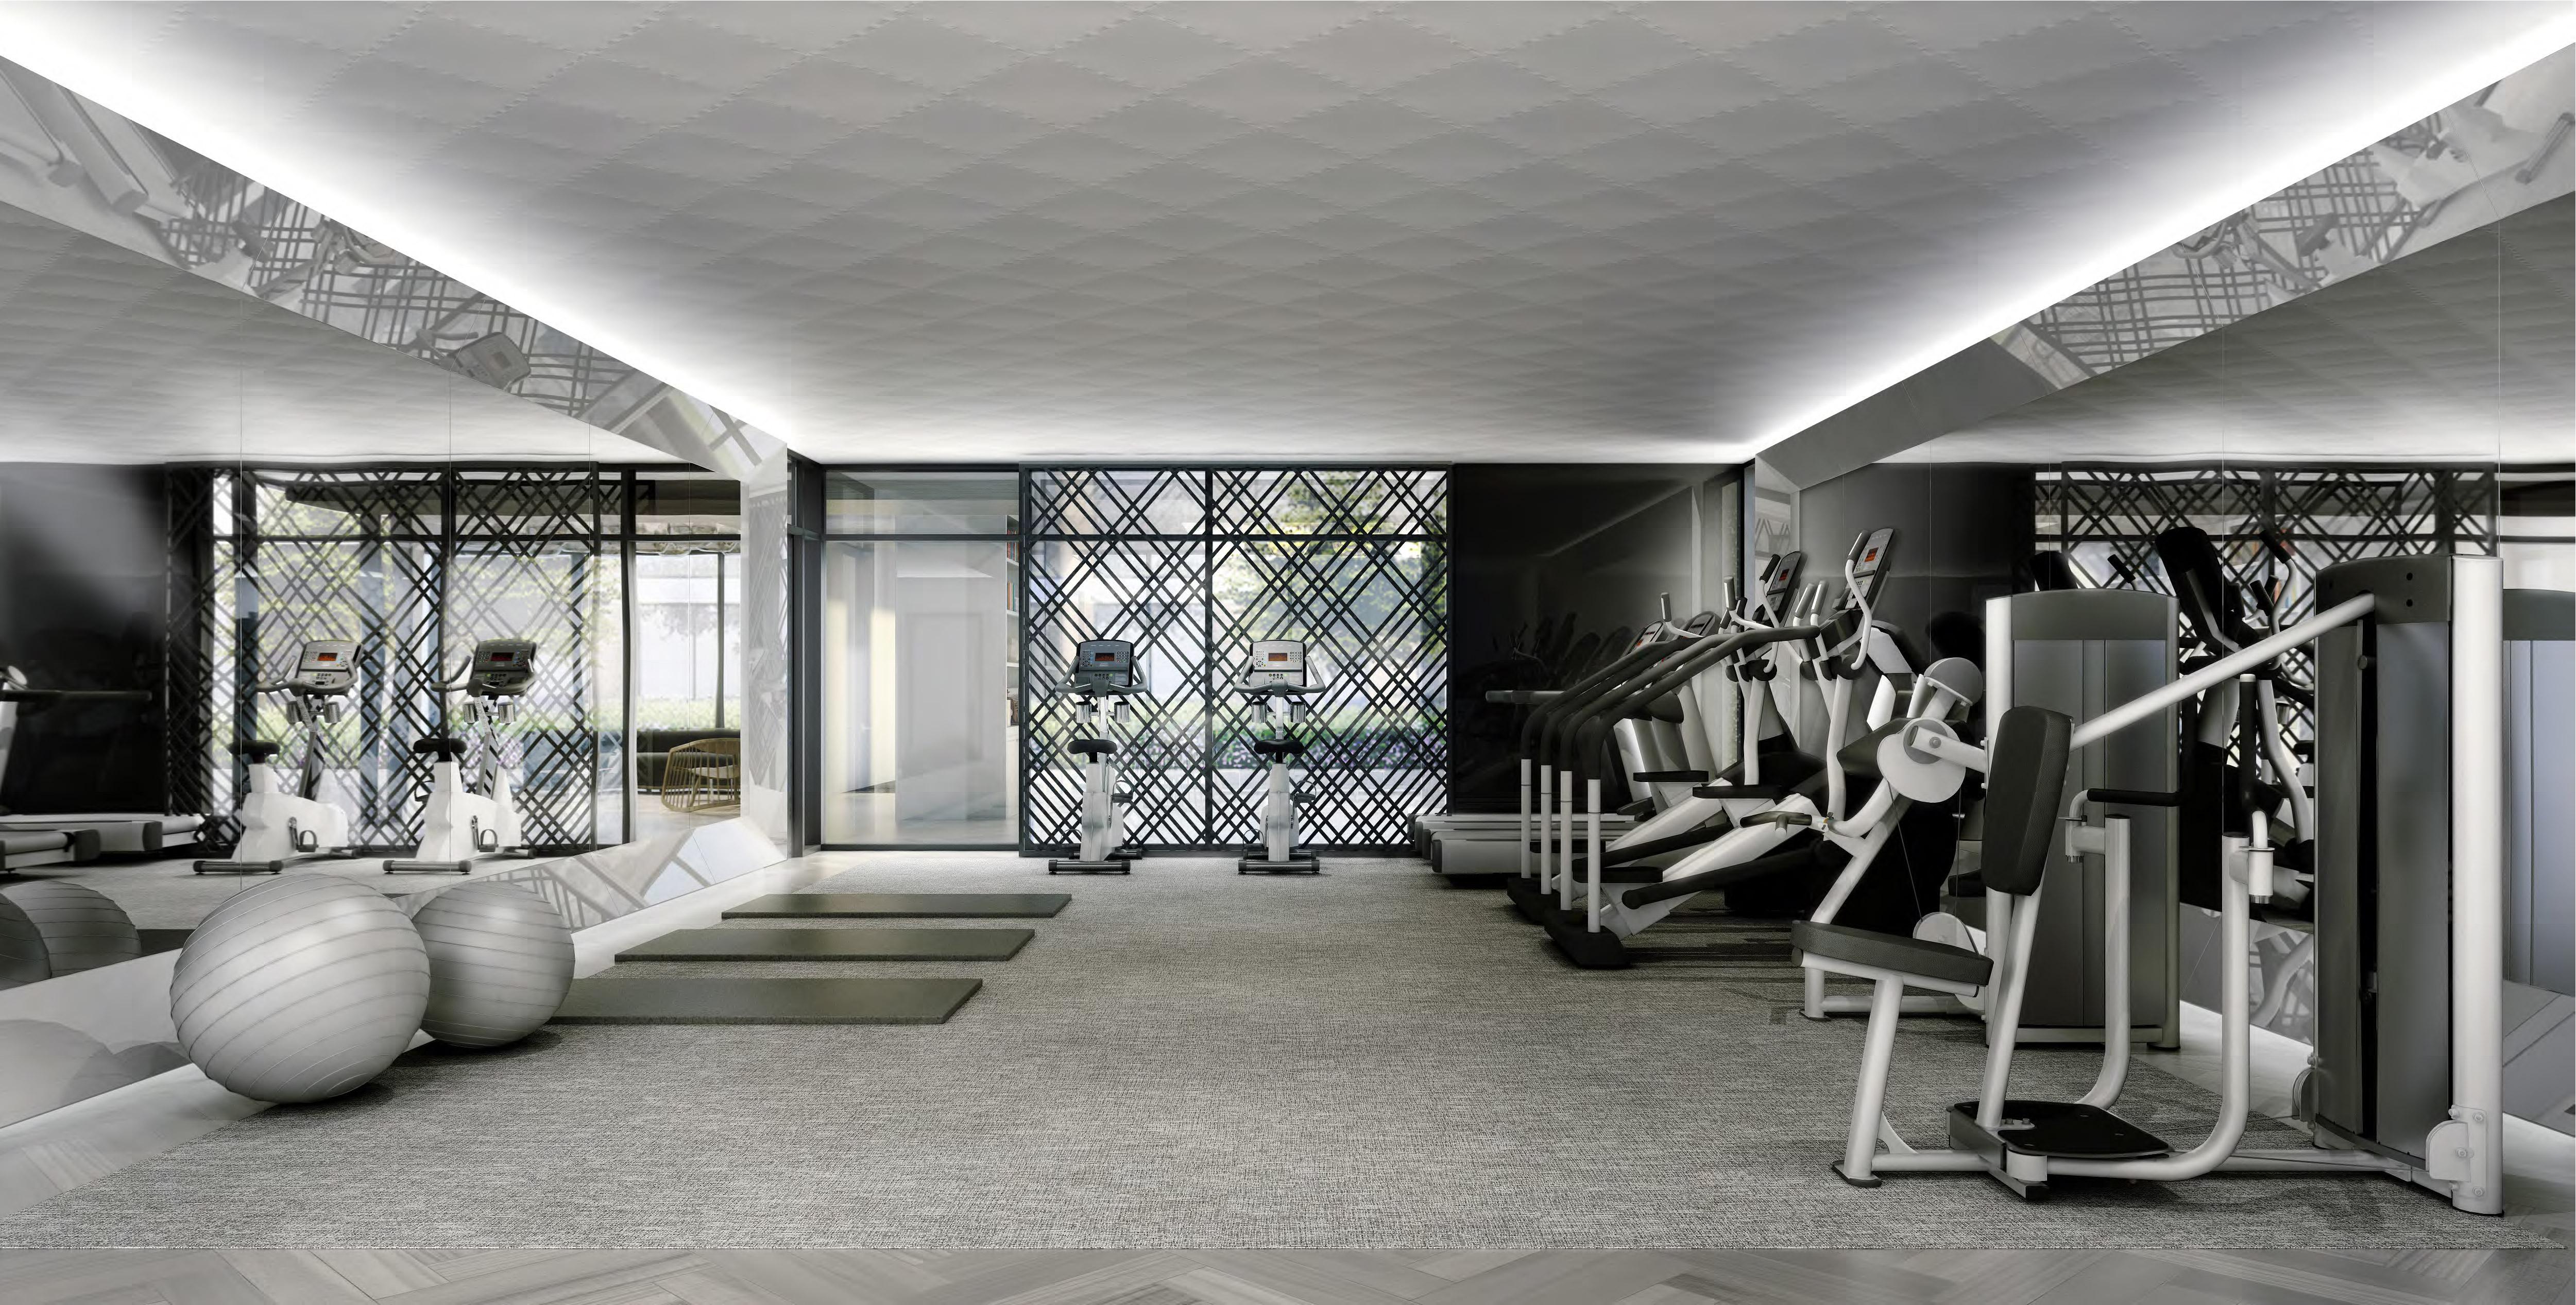 Great Gulf Trafalgar Landing rendering of gym with grey patterned carpeting, black crisscross metal screen, and workout equipment